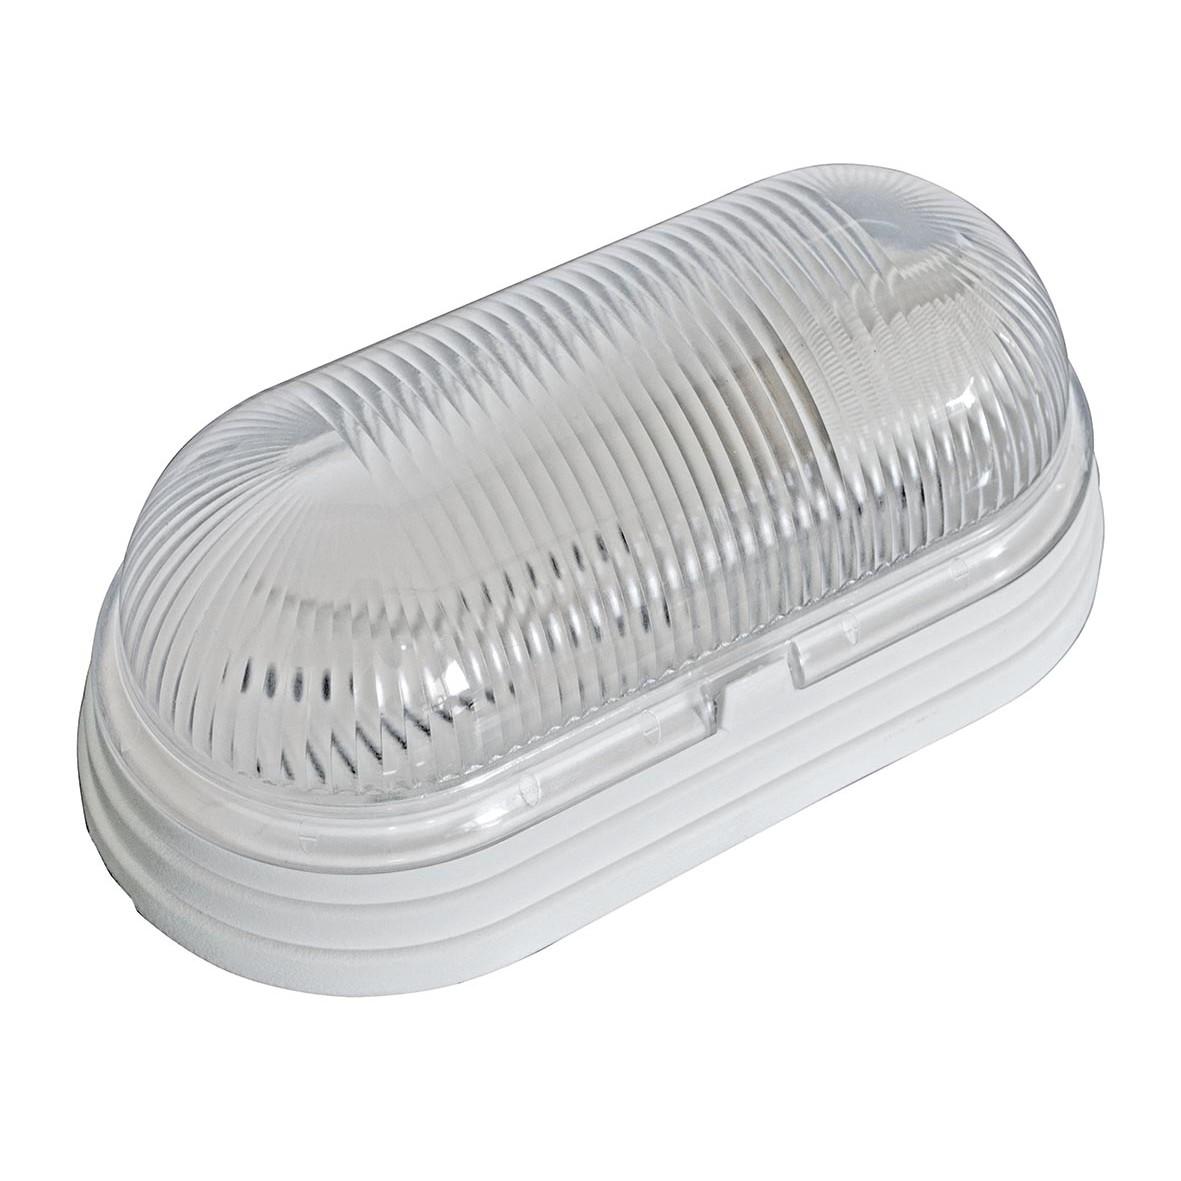 Luminaria Oval Plastica Tartaruga Branca Bivolt - Dital